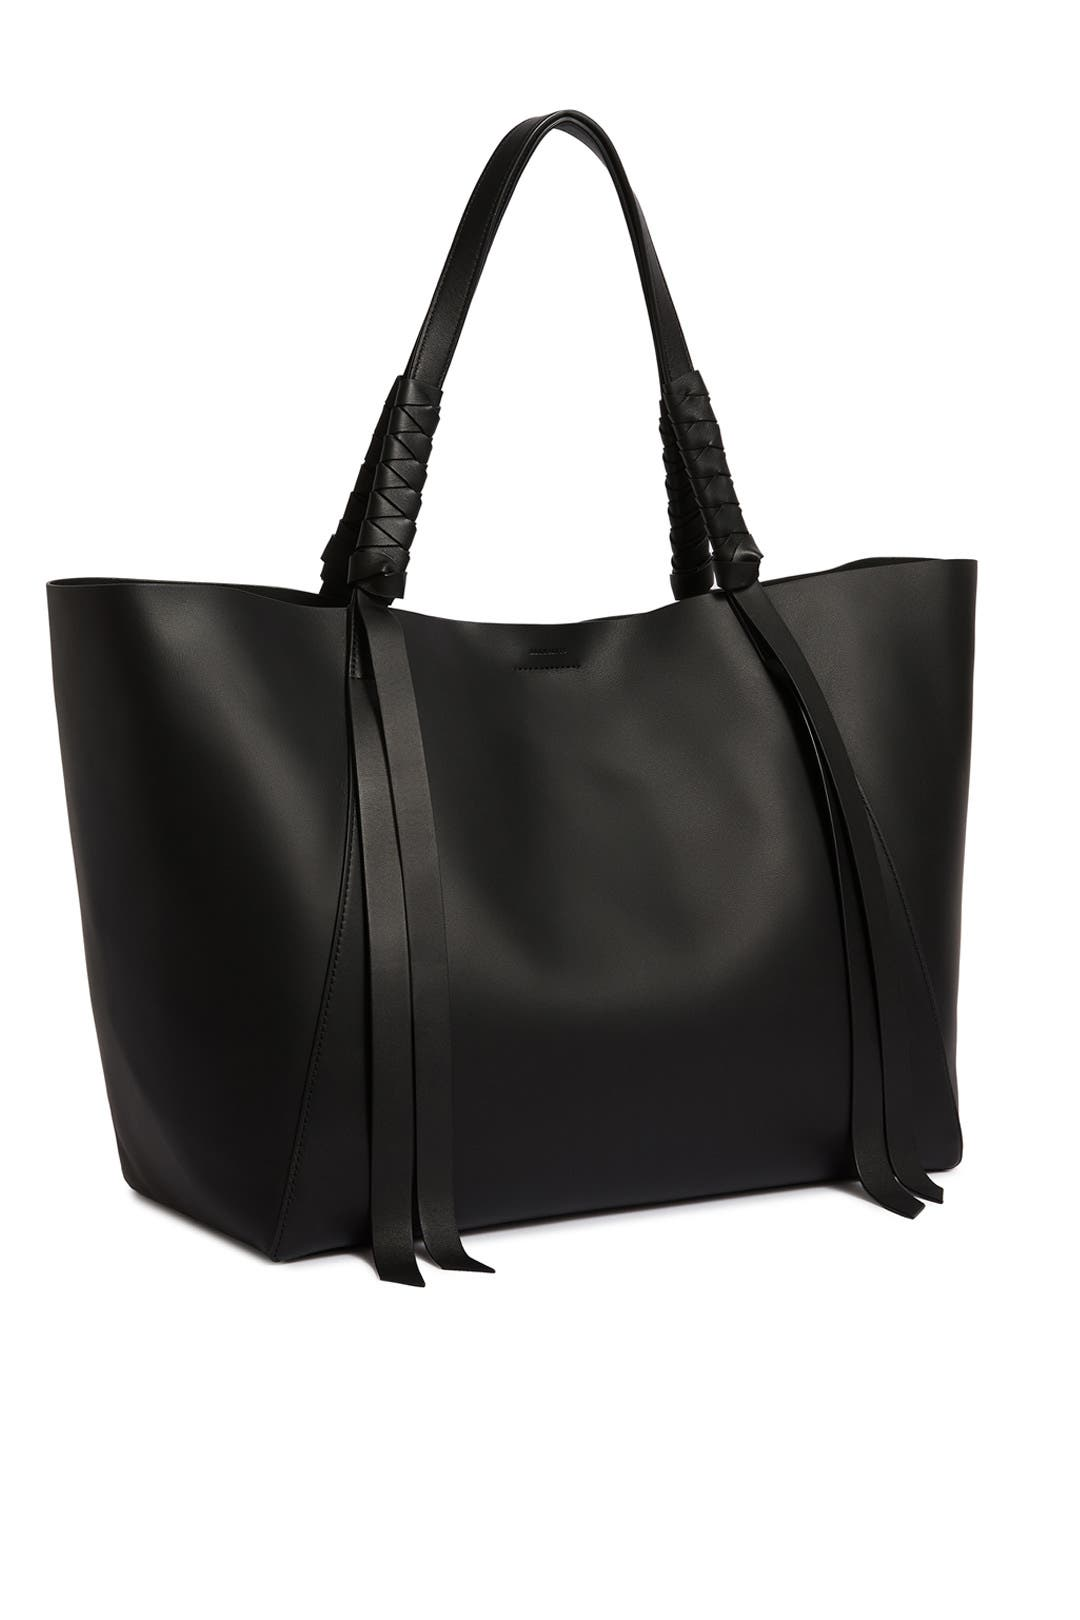 AllSaints Voltaire Large Leather Tote Bag Black MSRP $378 Women